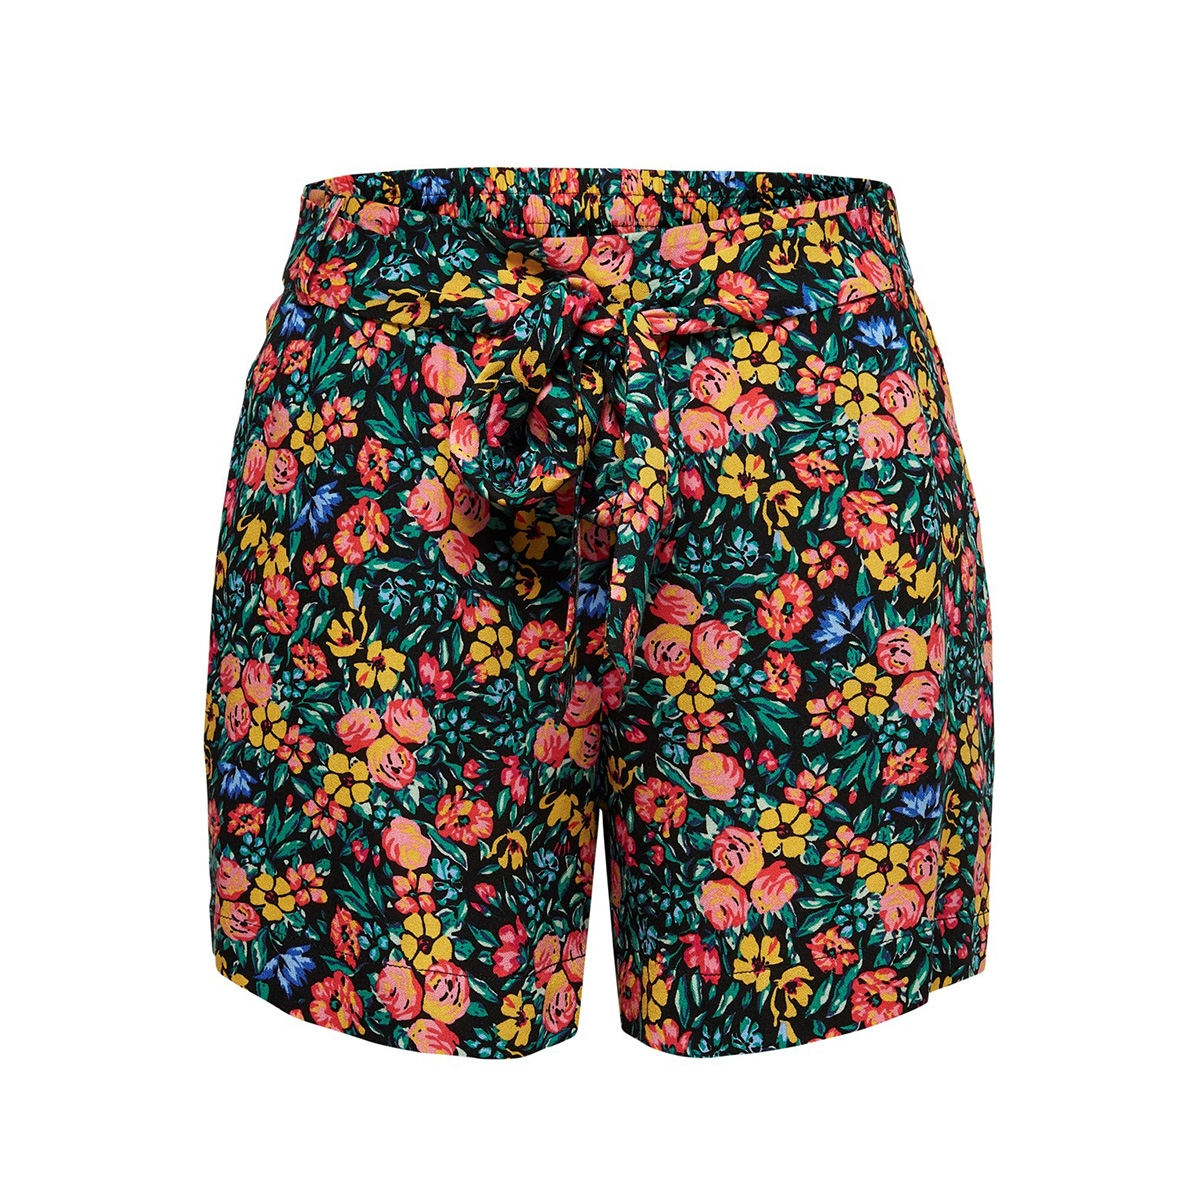 jdykenya shorts wvn 15174486 jacqueline de yong korte broek black/multicolor